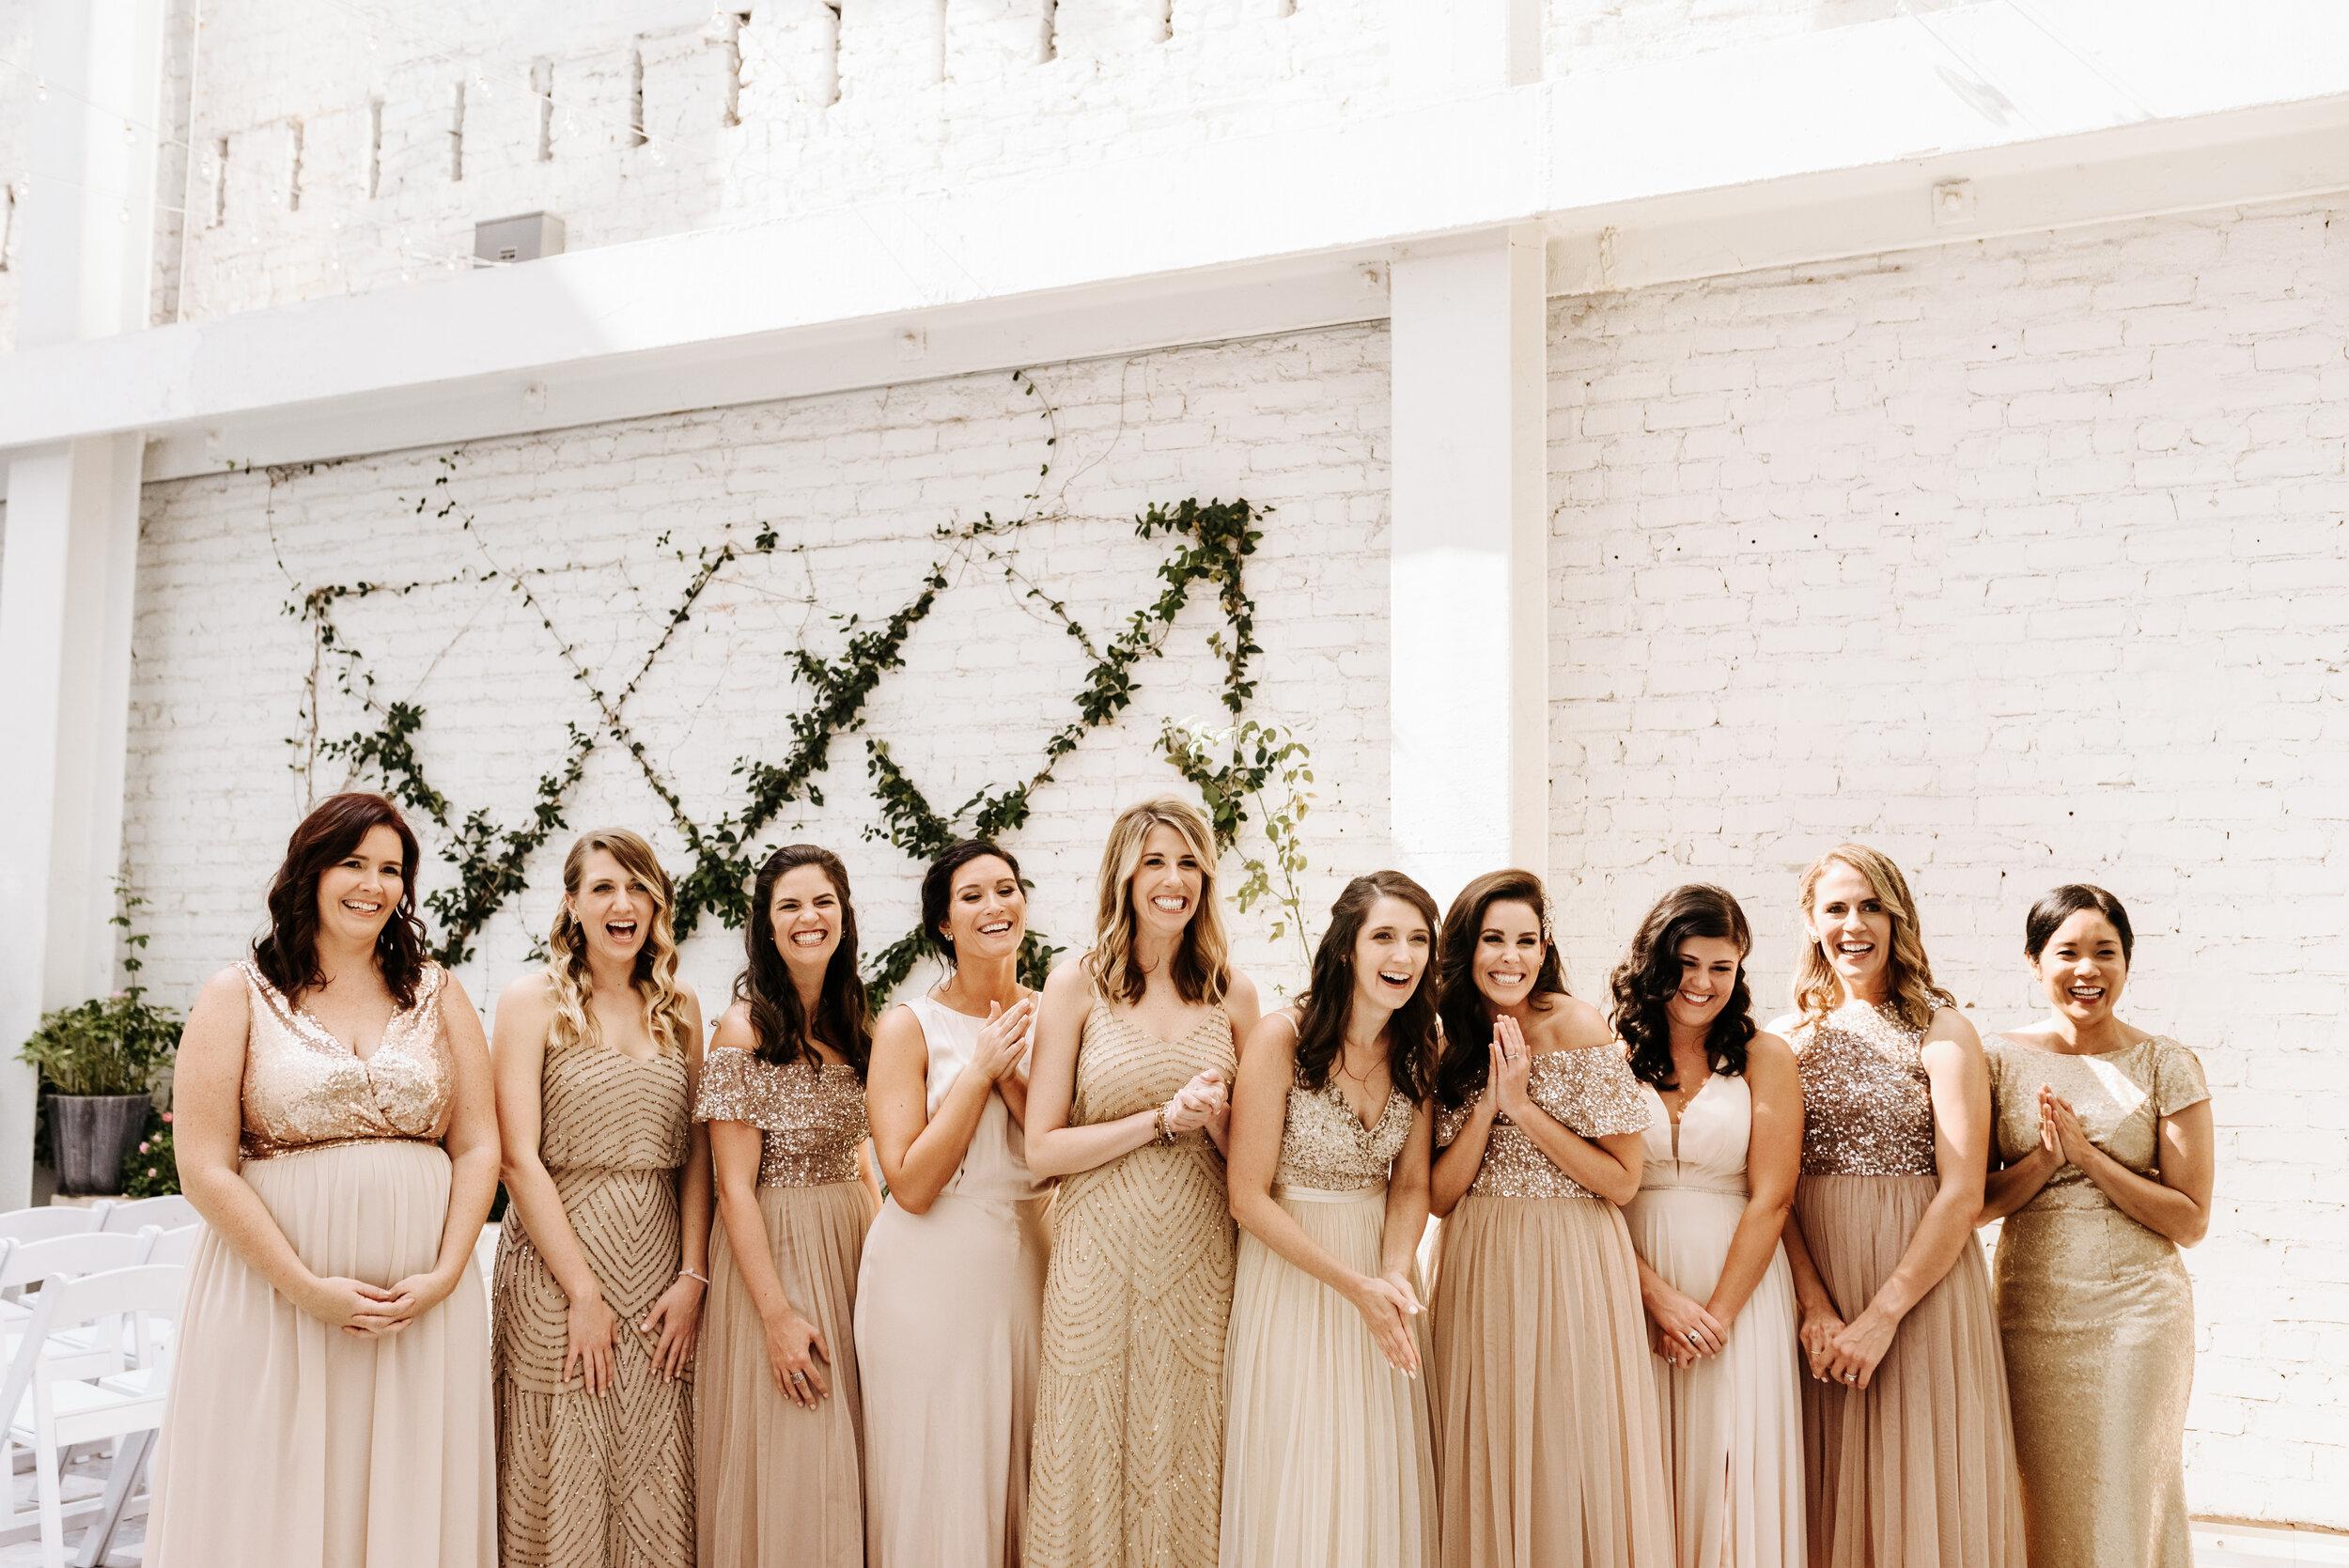 Cassie-Mrunal-Wedding-Quirk-Hotel-John-Marshall-Ballrooms-Richmond-Virginia-Photography-by-V-15.jpg